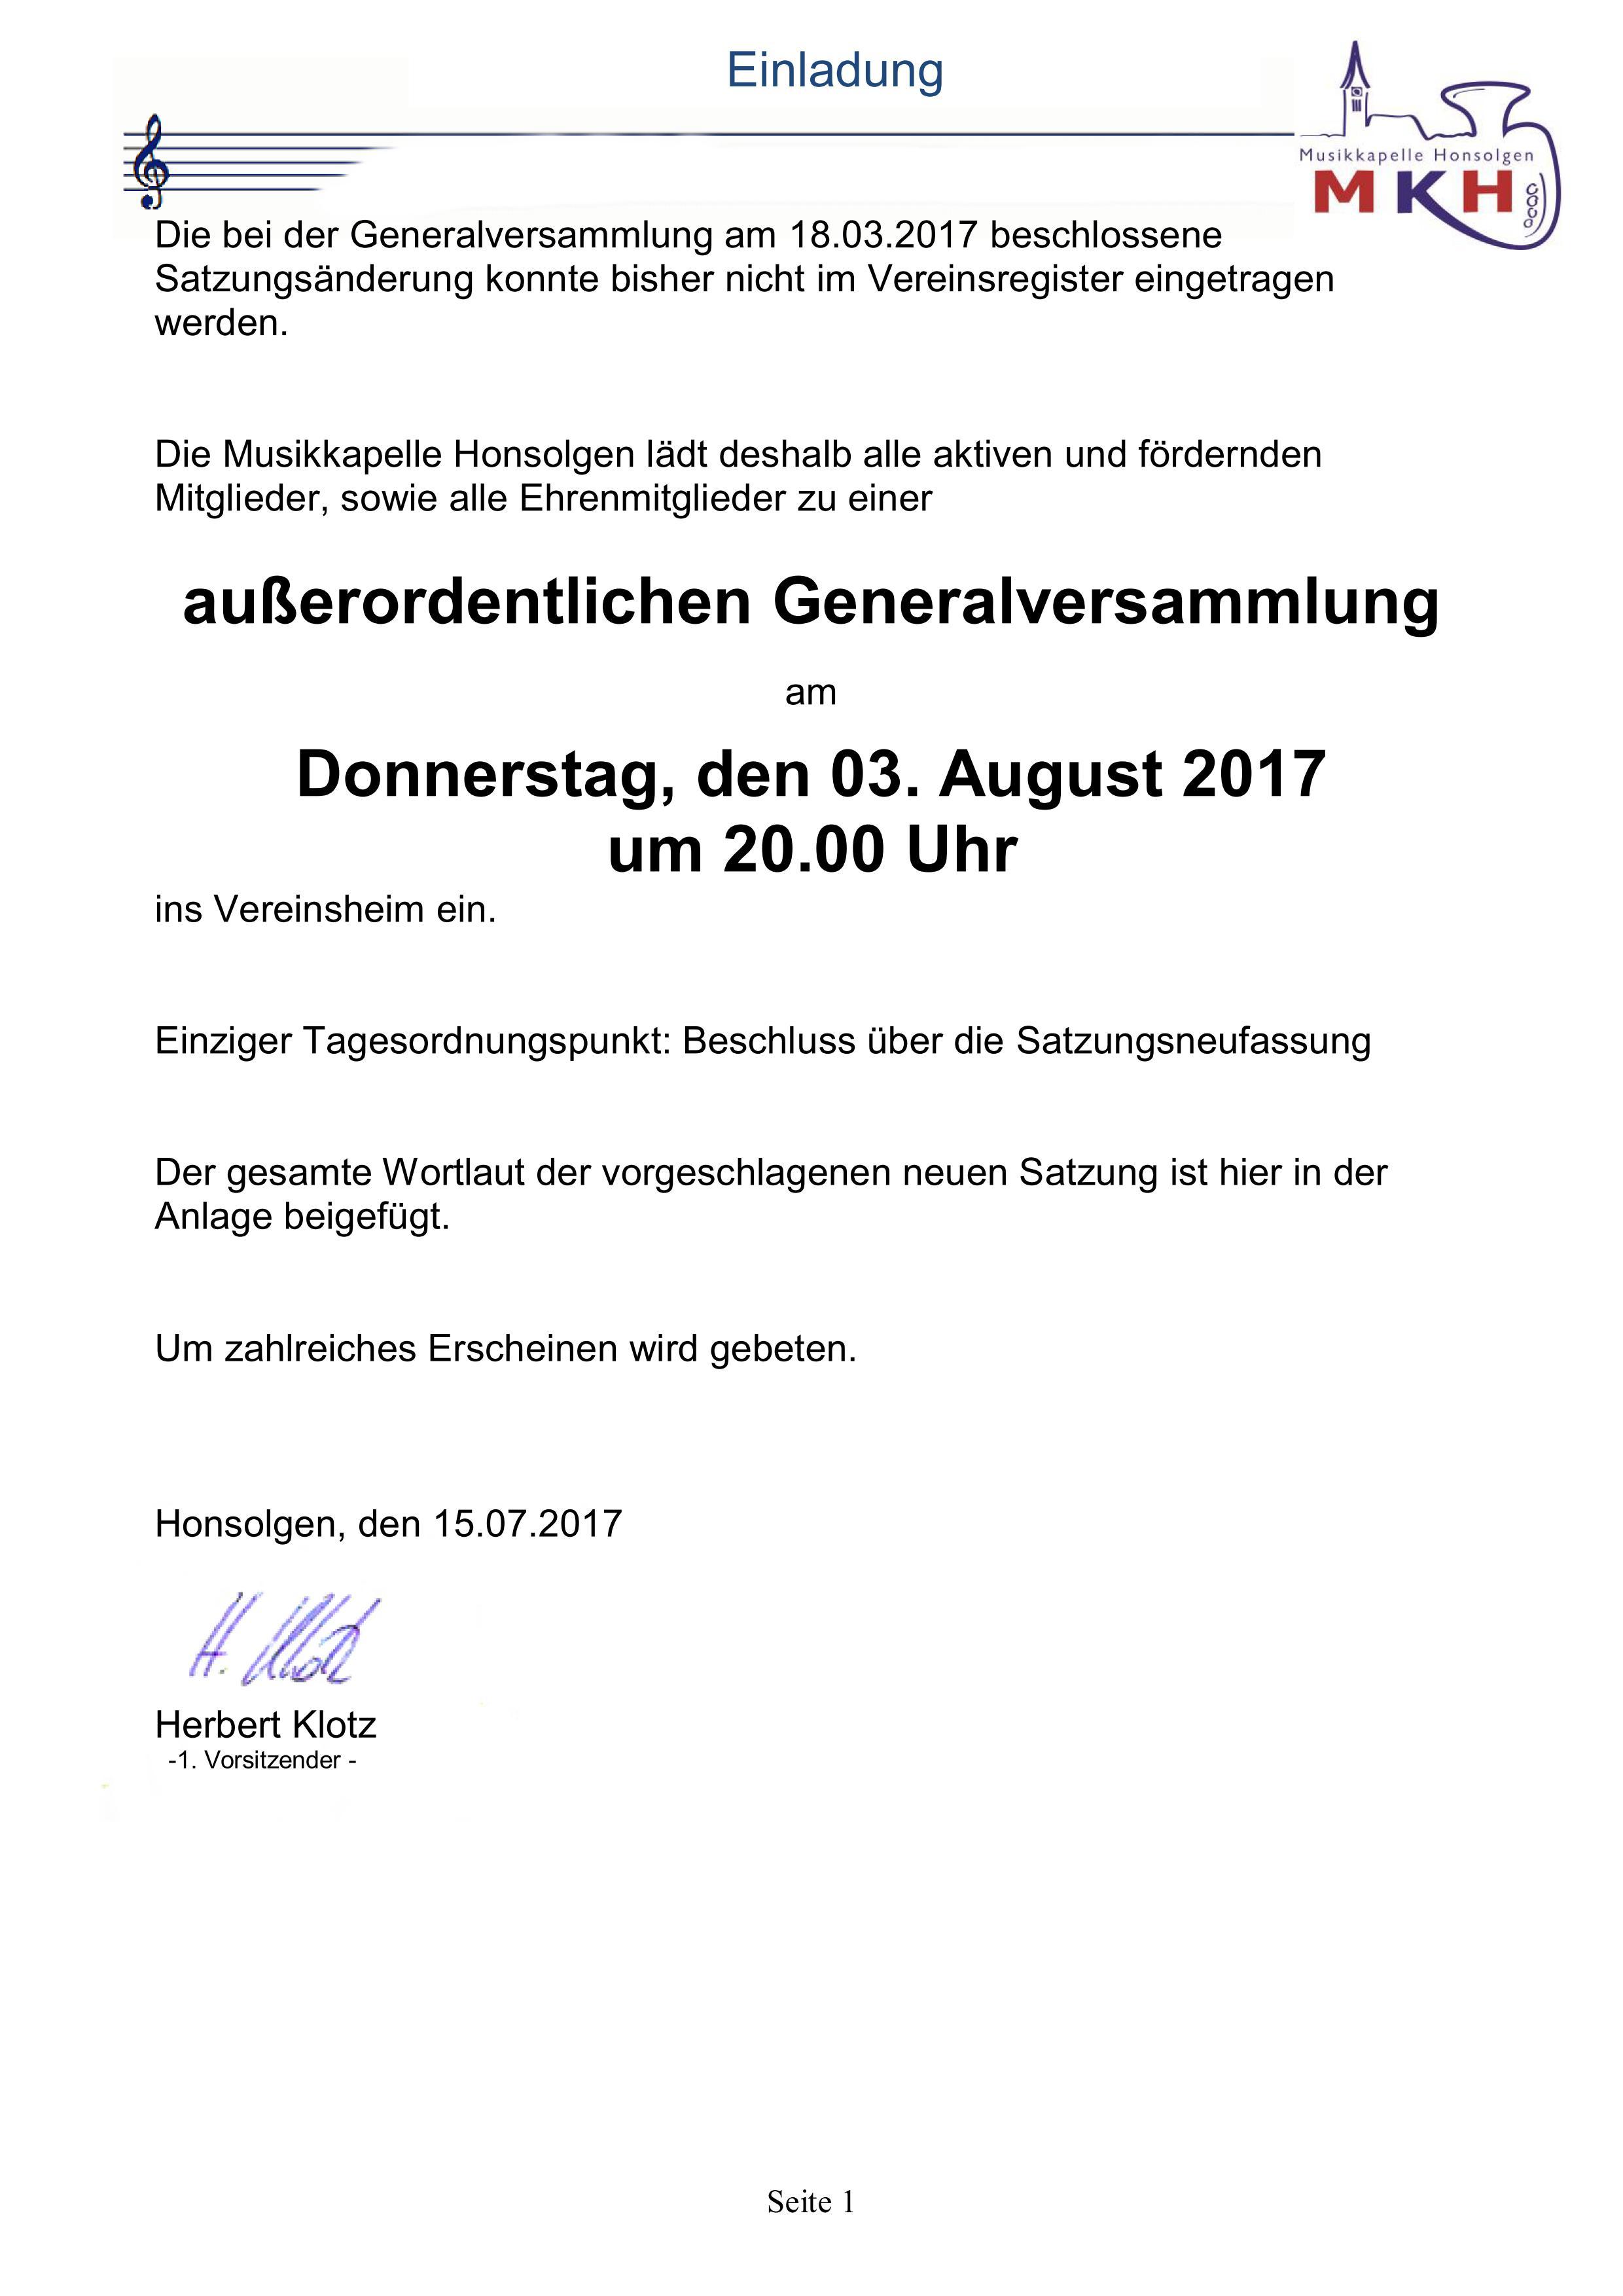 außerordentliche Generalversammlung – Musikkapelle Honsolgen e.V.